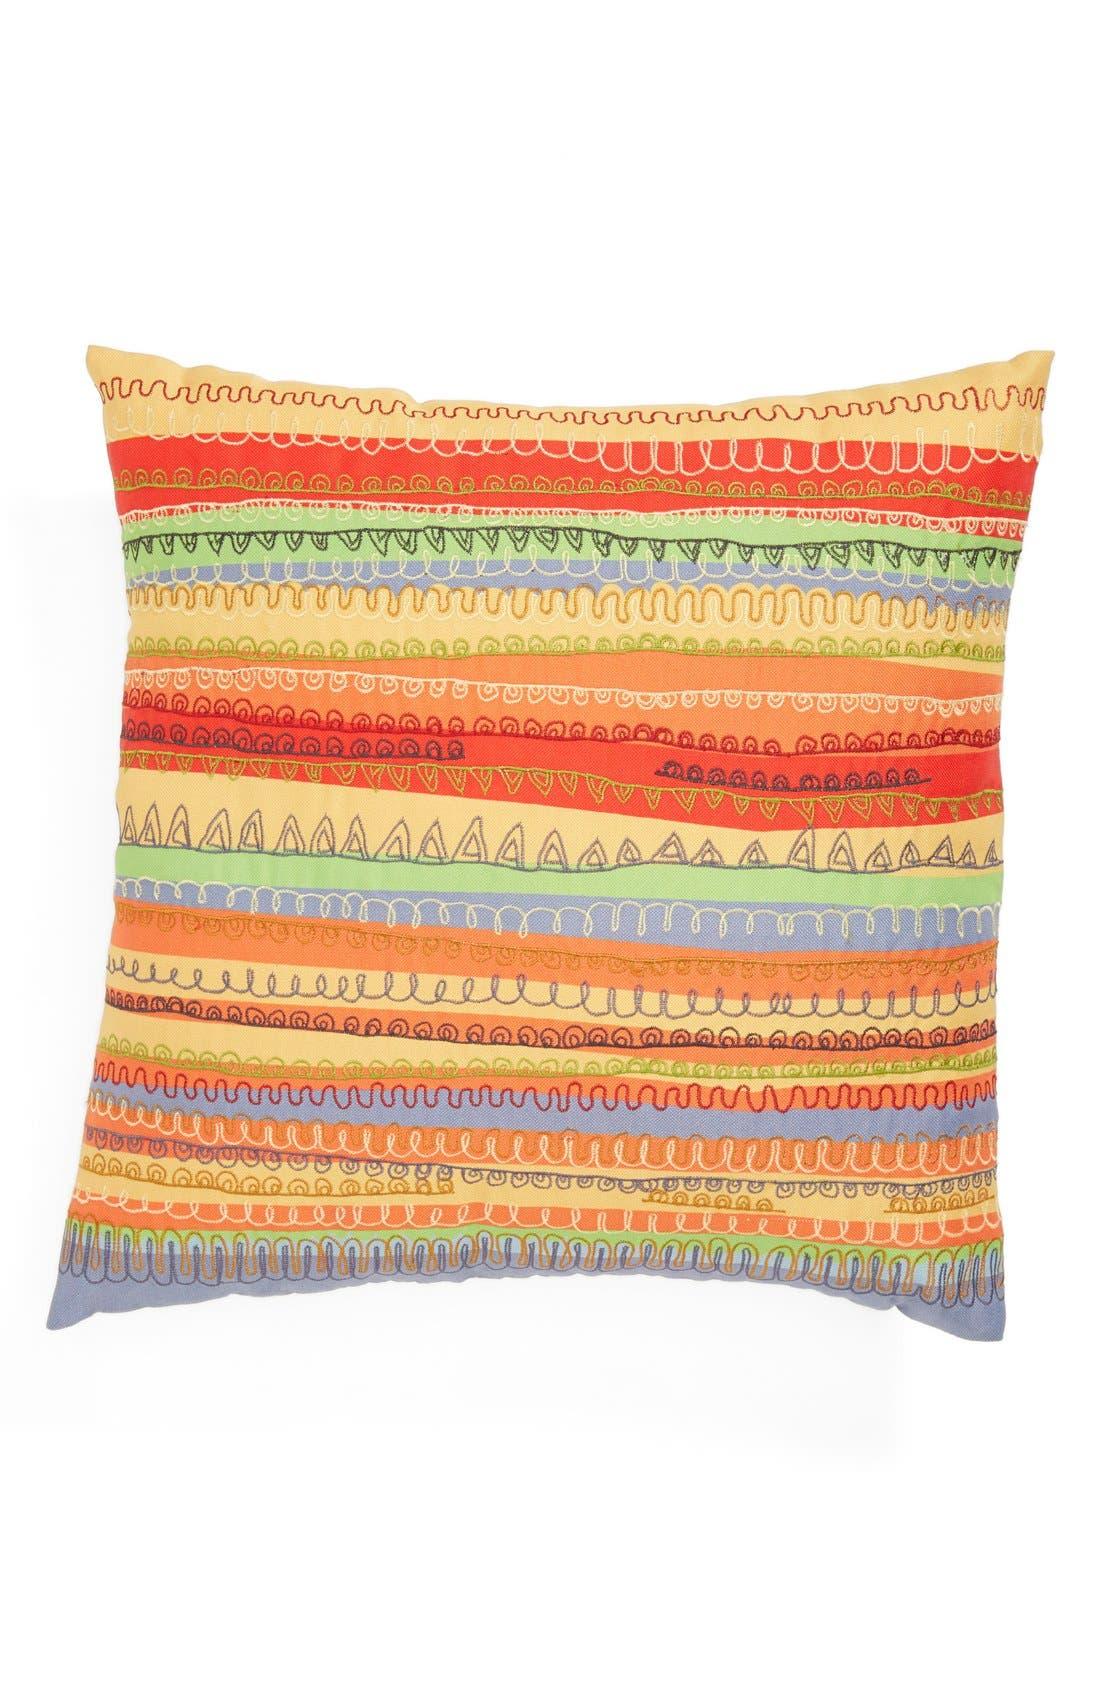 Alternate Image 1 Selected - Mina Victory 'Fiesta' Pillow